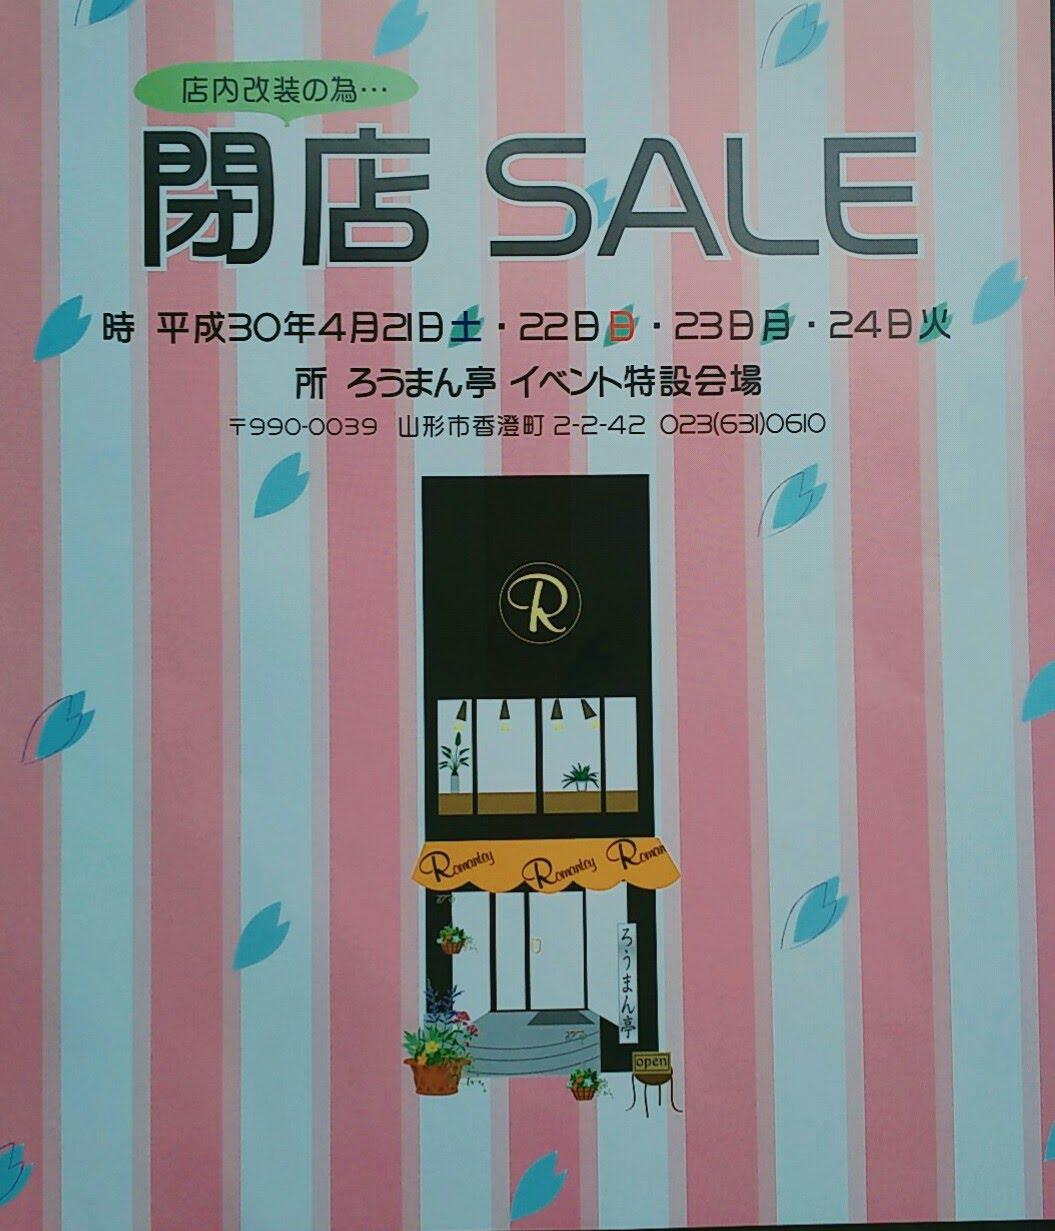 http://www.tomihiro.co.jp/news/2018/04/14/IMG_20180414_134747.jpg